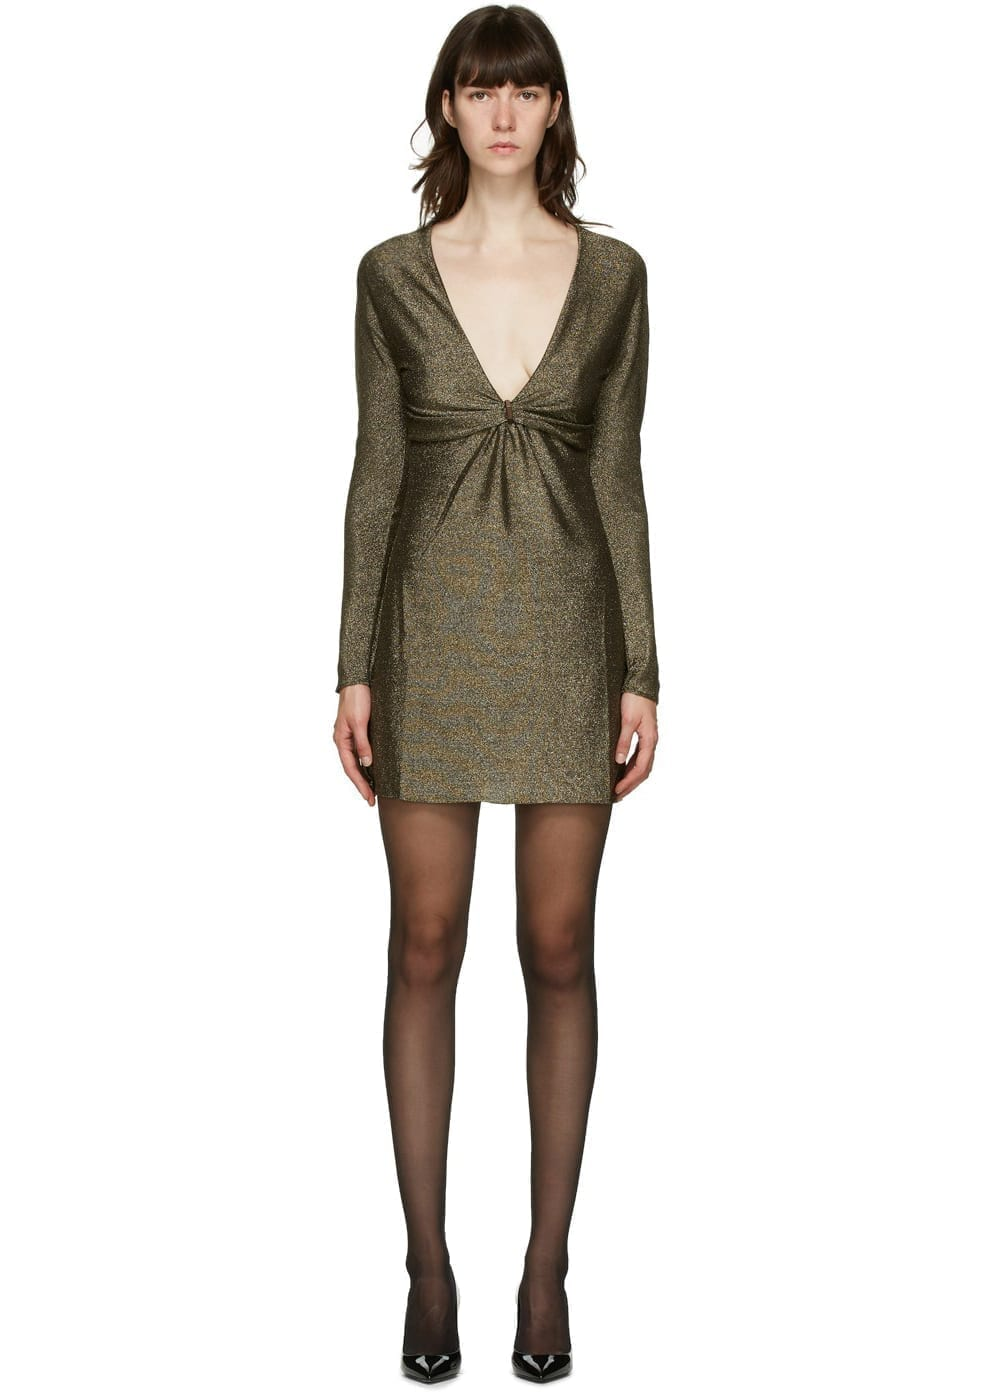 SAINT LAURENT Gold Lurex Short Dress